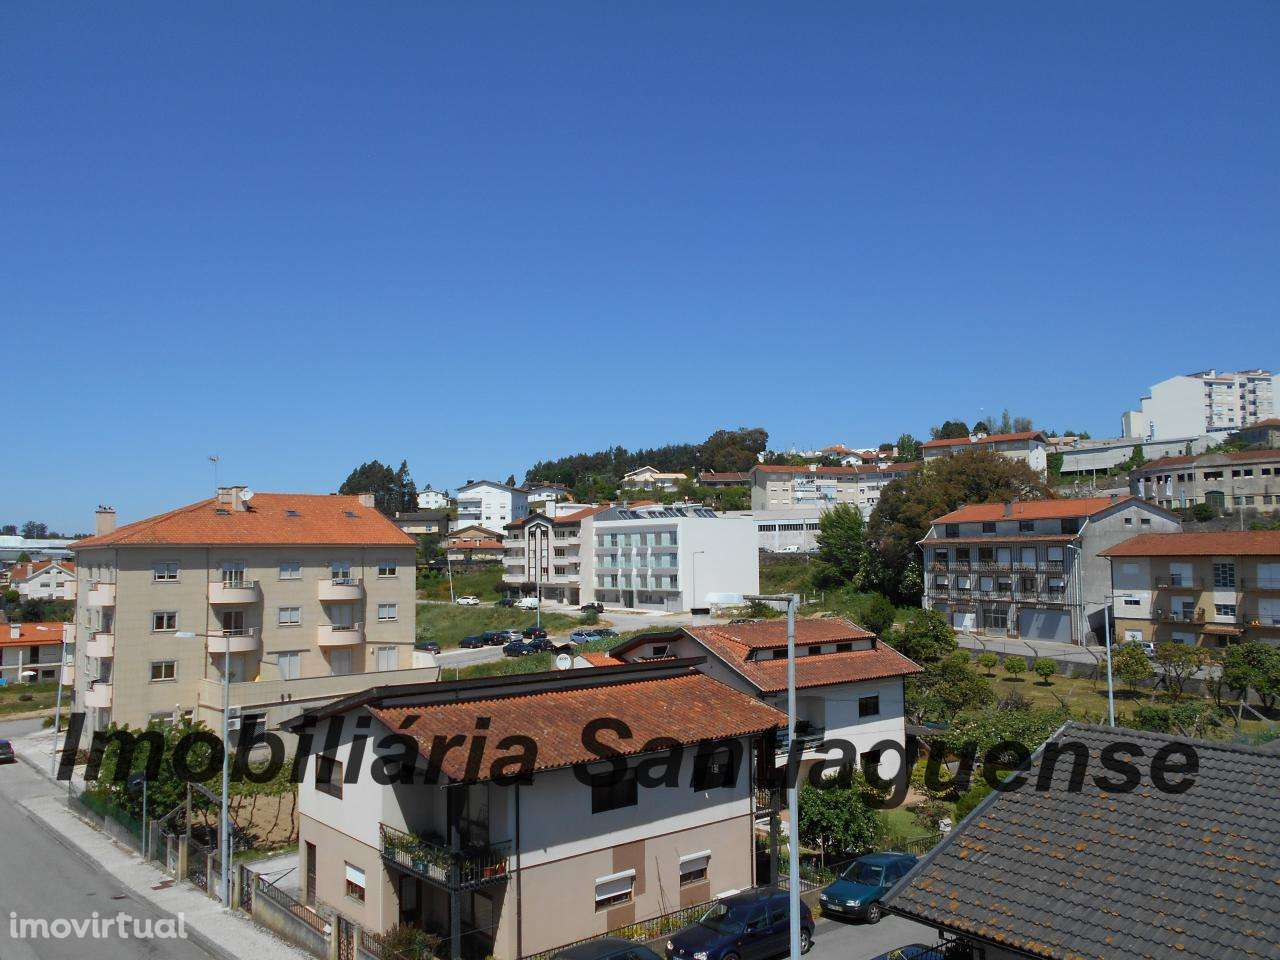 Apartamento para comprar, Oliveira de Azeméis, Santiago de Riba-Ul, Ul, Macinhata da Seixa e Madail, Aveiro - Foto 6